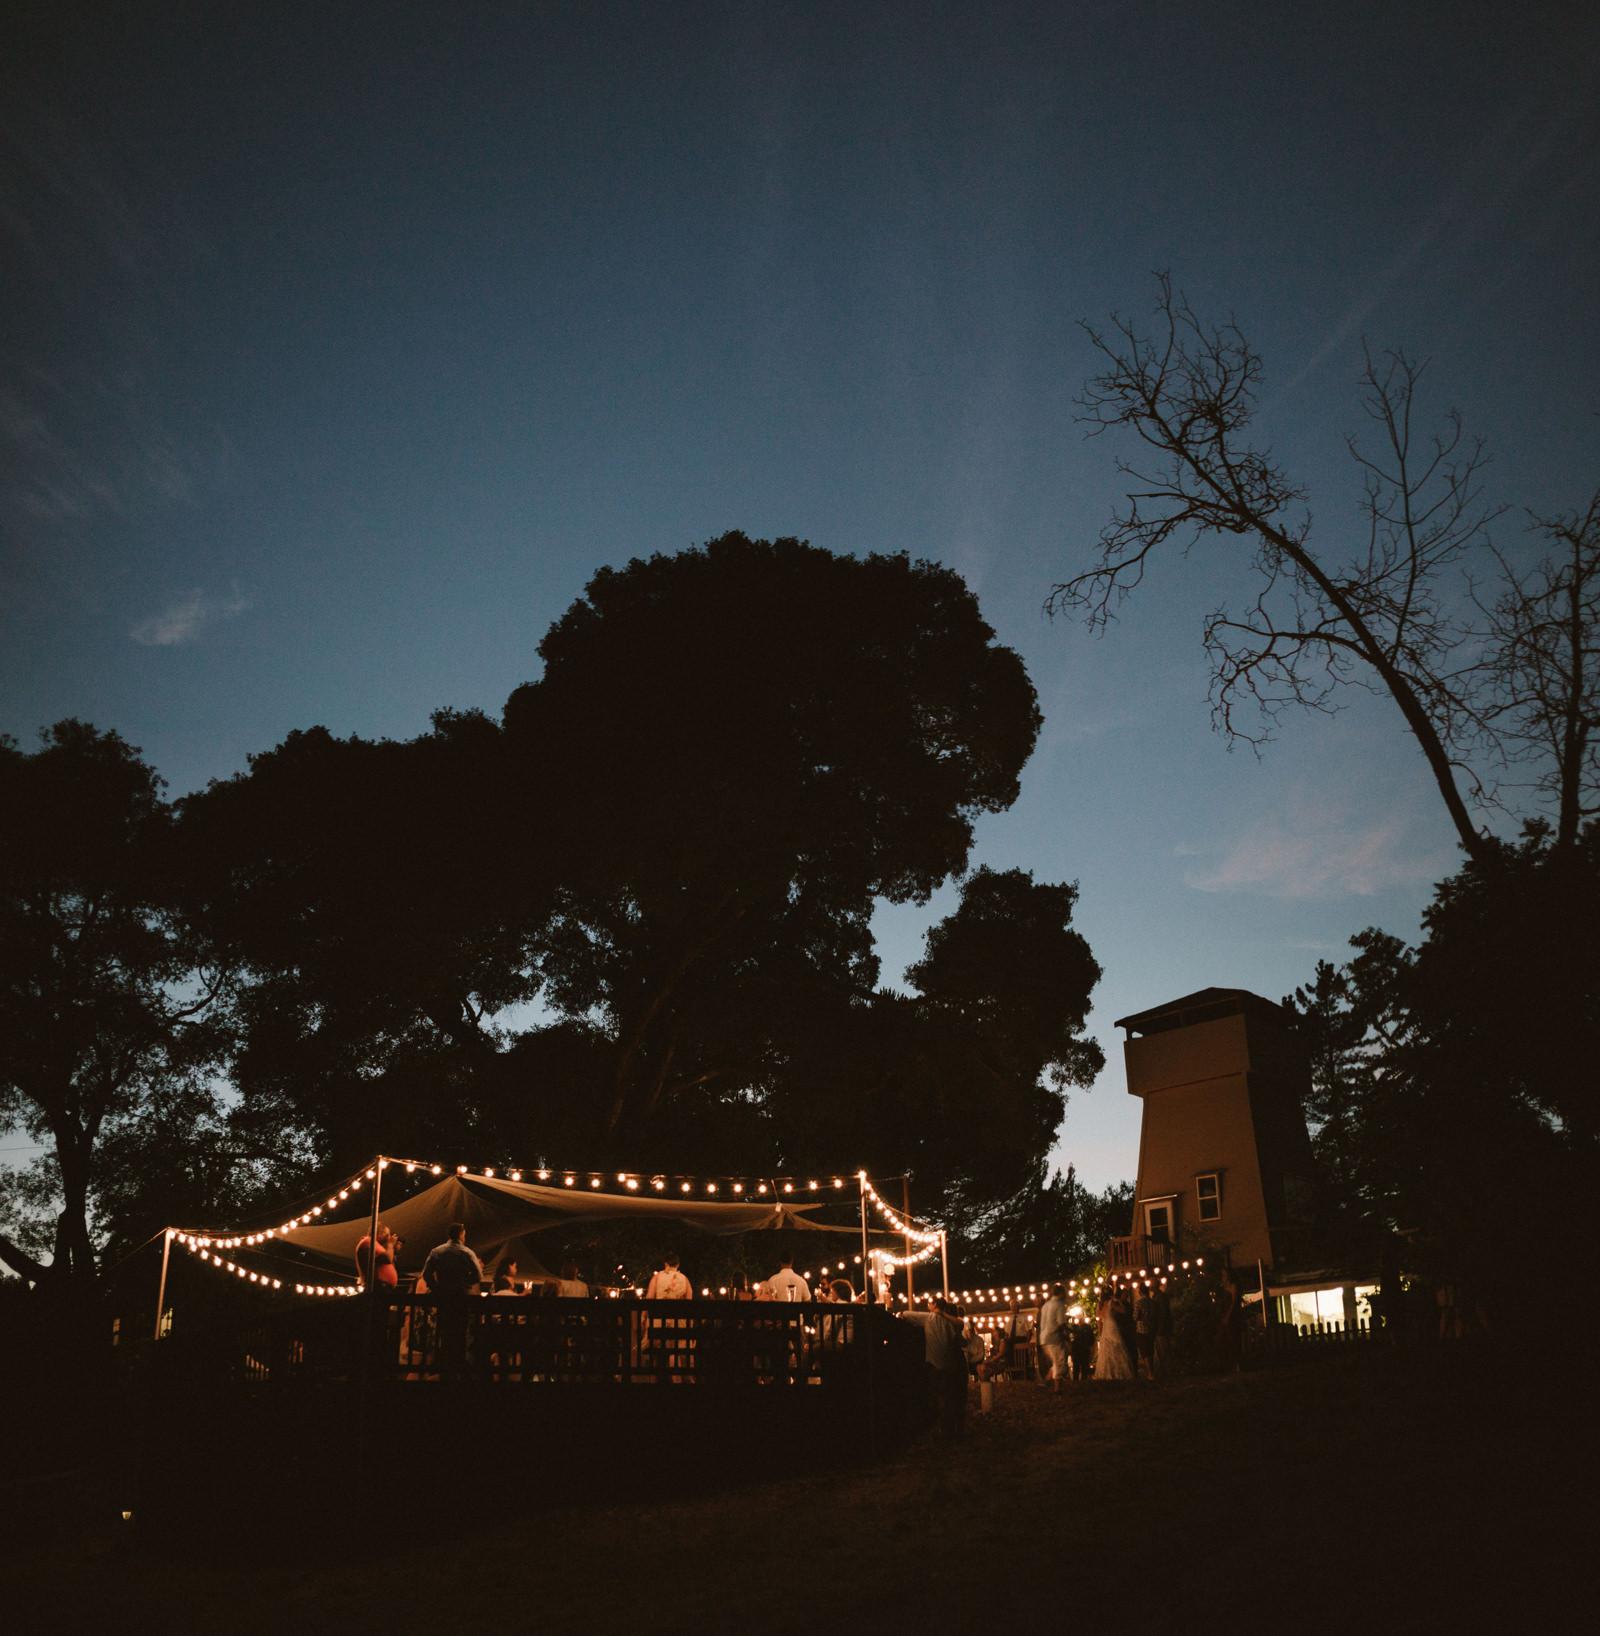 rivers-bend-retreat-wedding-111 RIVER'S BEND RETREAT WEDDING